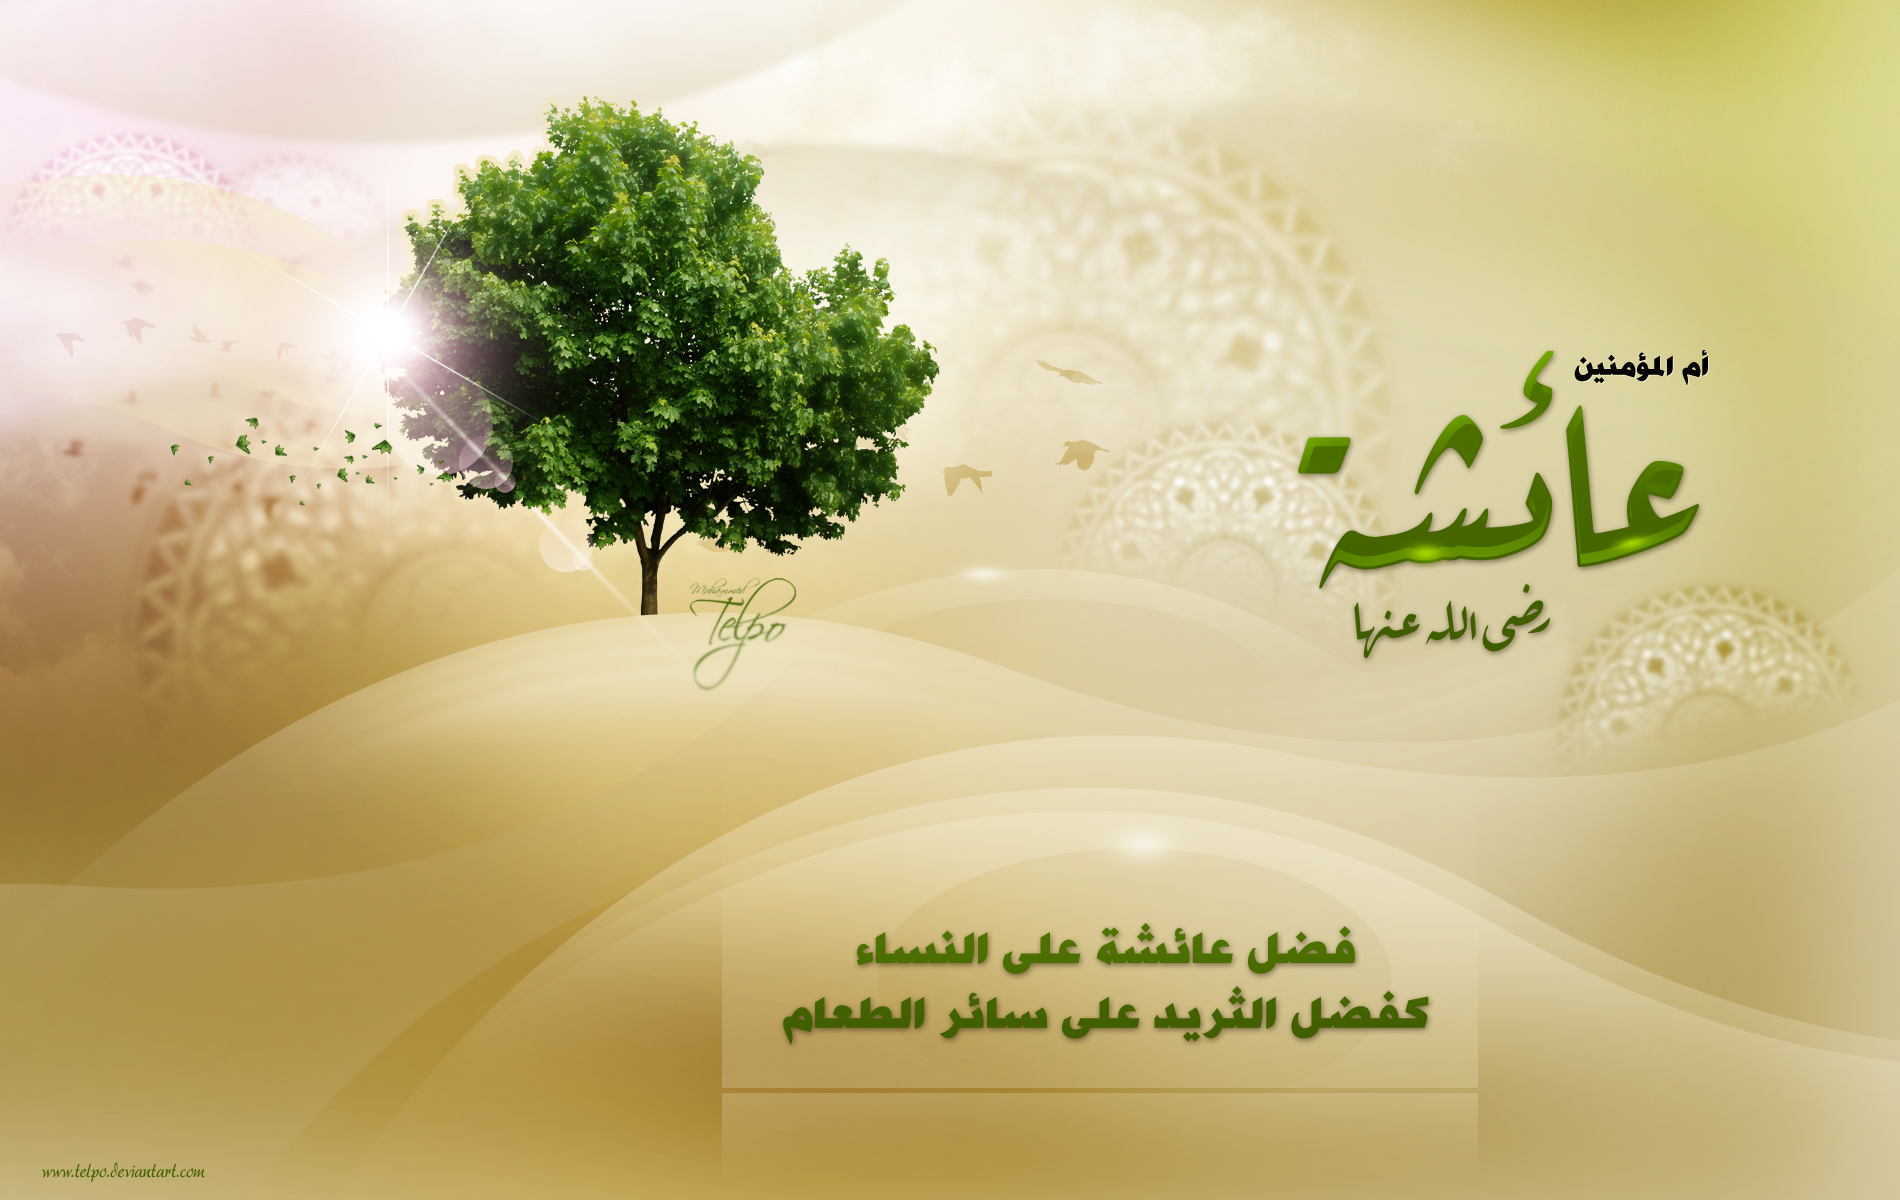 Aisha Name Wallpaper Themes - WallpaperSafari